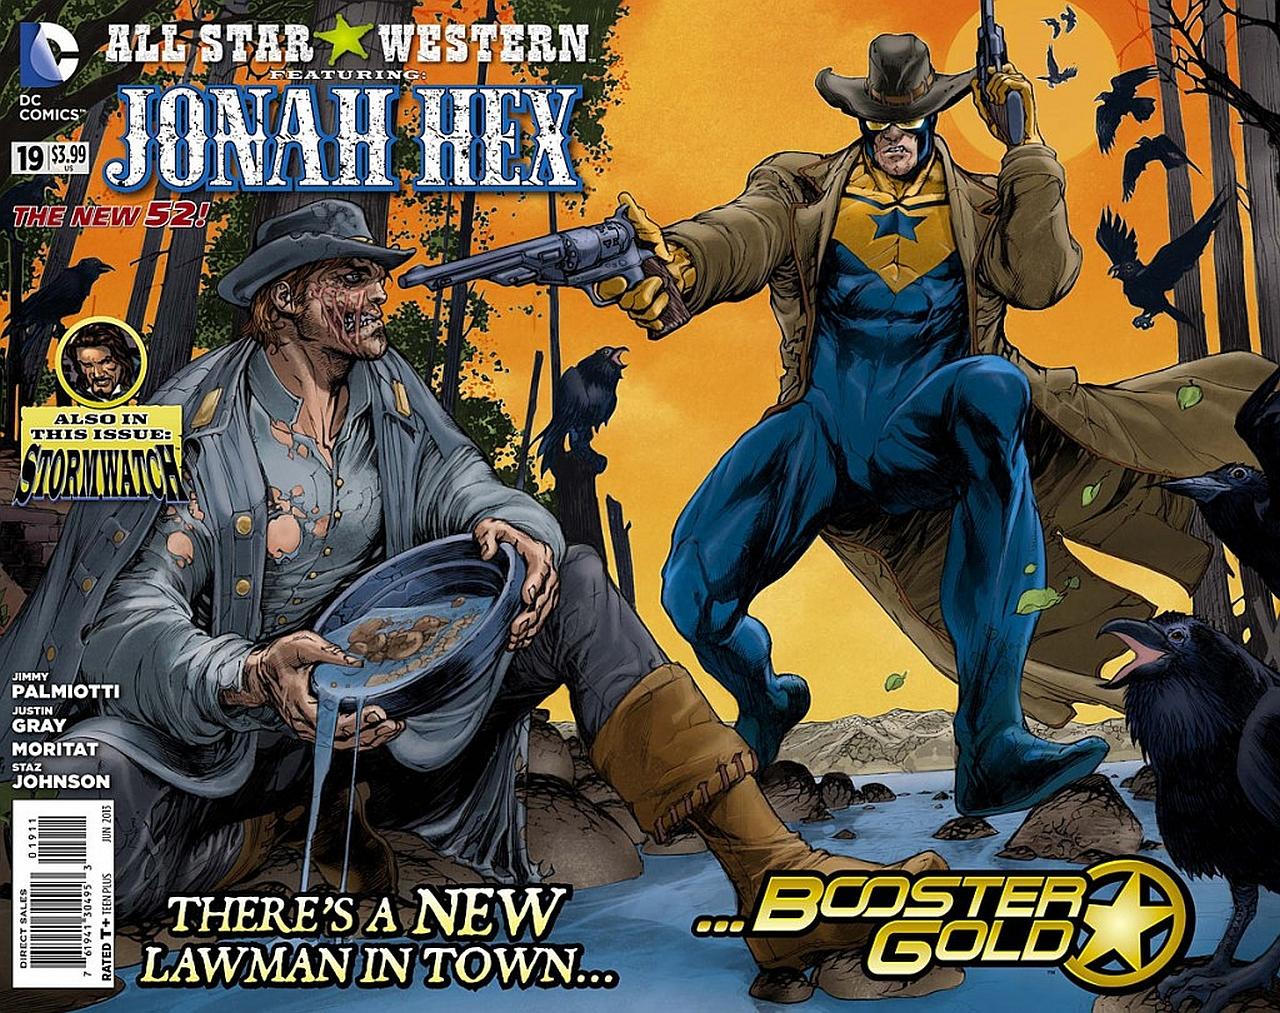 Booster Gold Jonah Hex 1280x1013